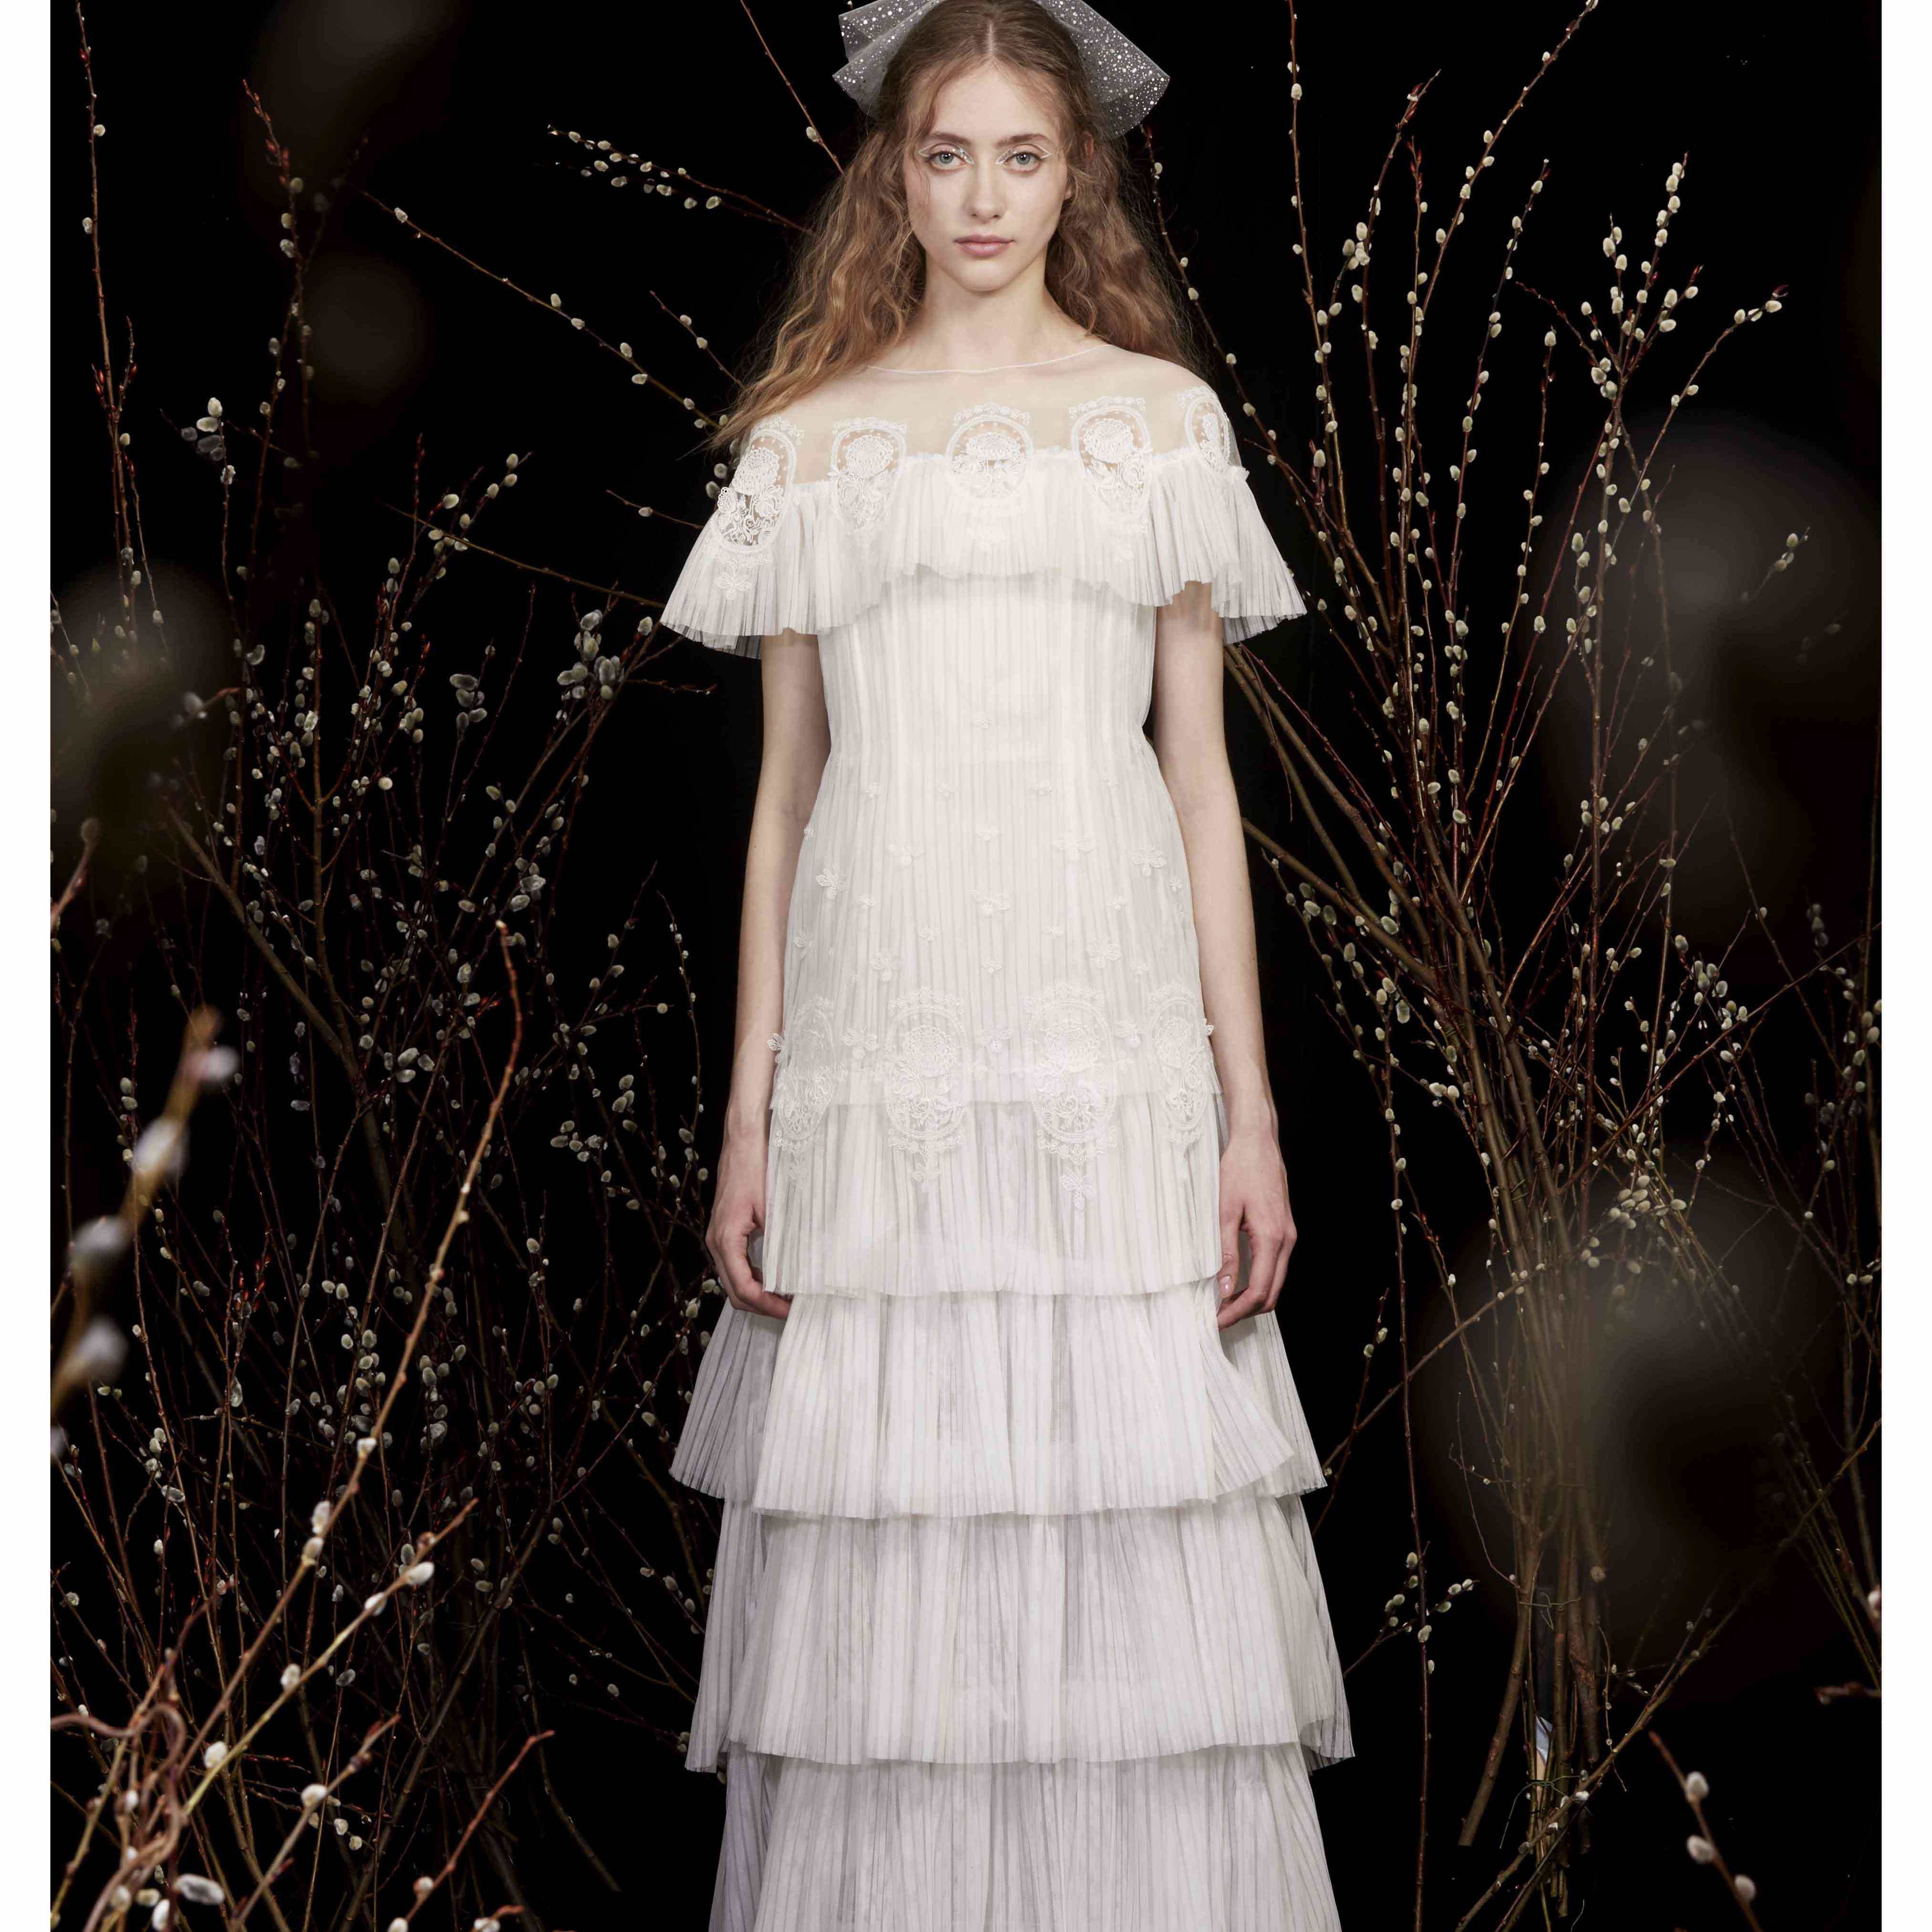 Model in tiered capelet wedding dress